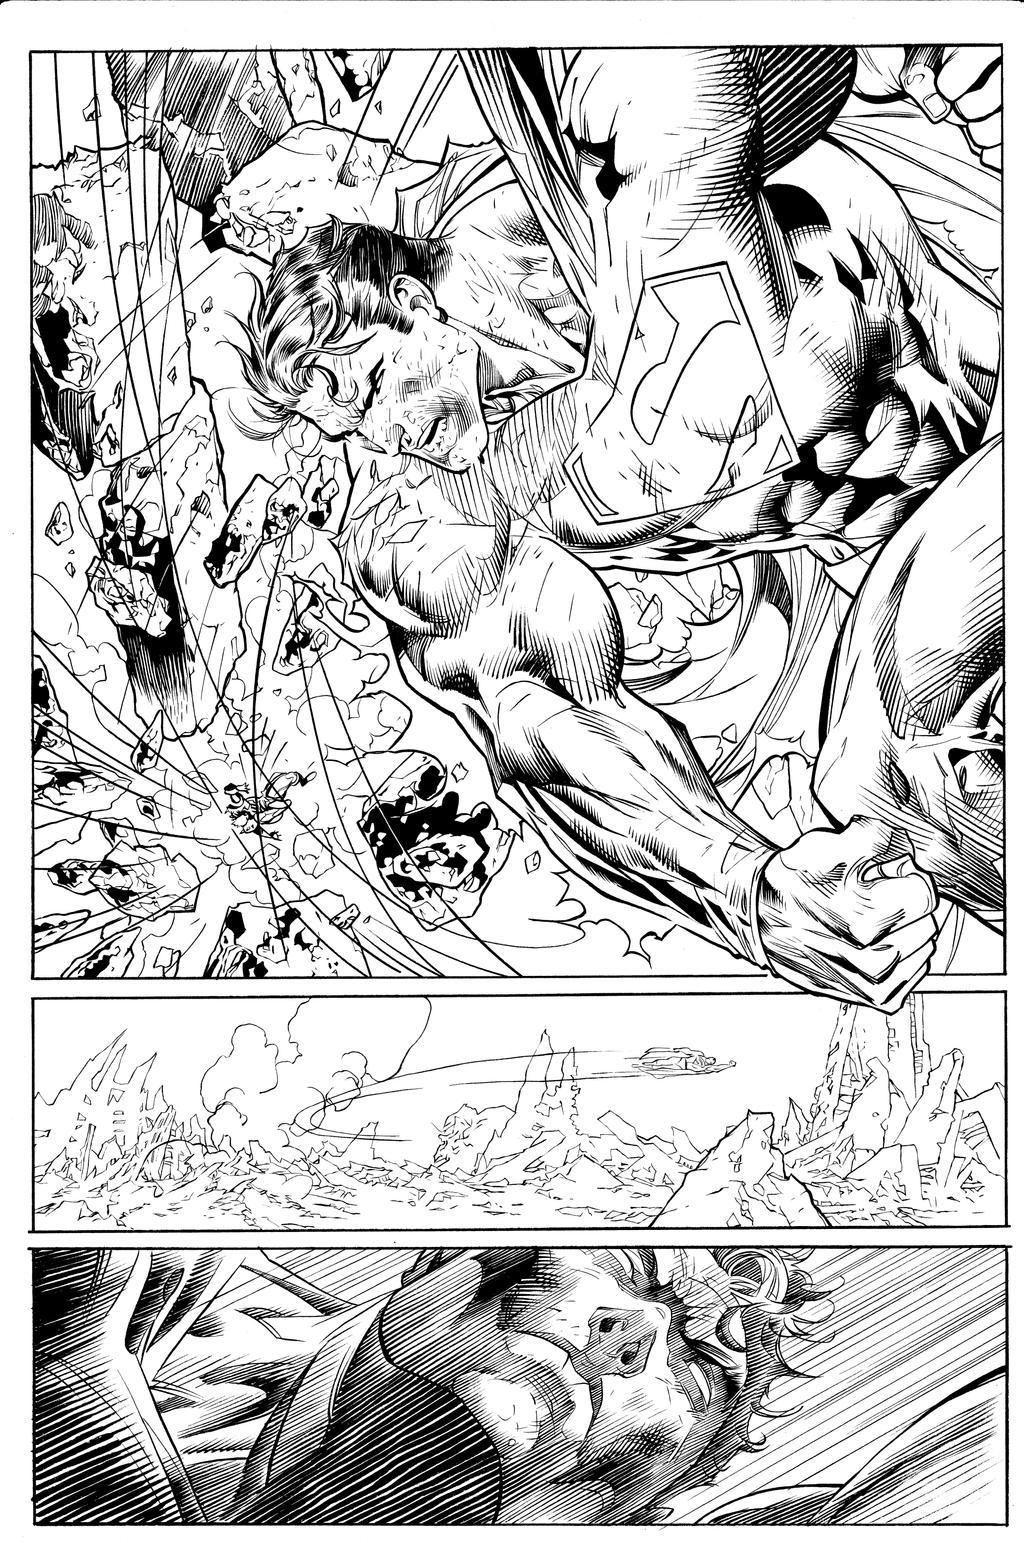 Jim Lee Superman inks by JosephLSilver